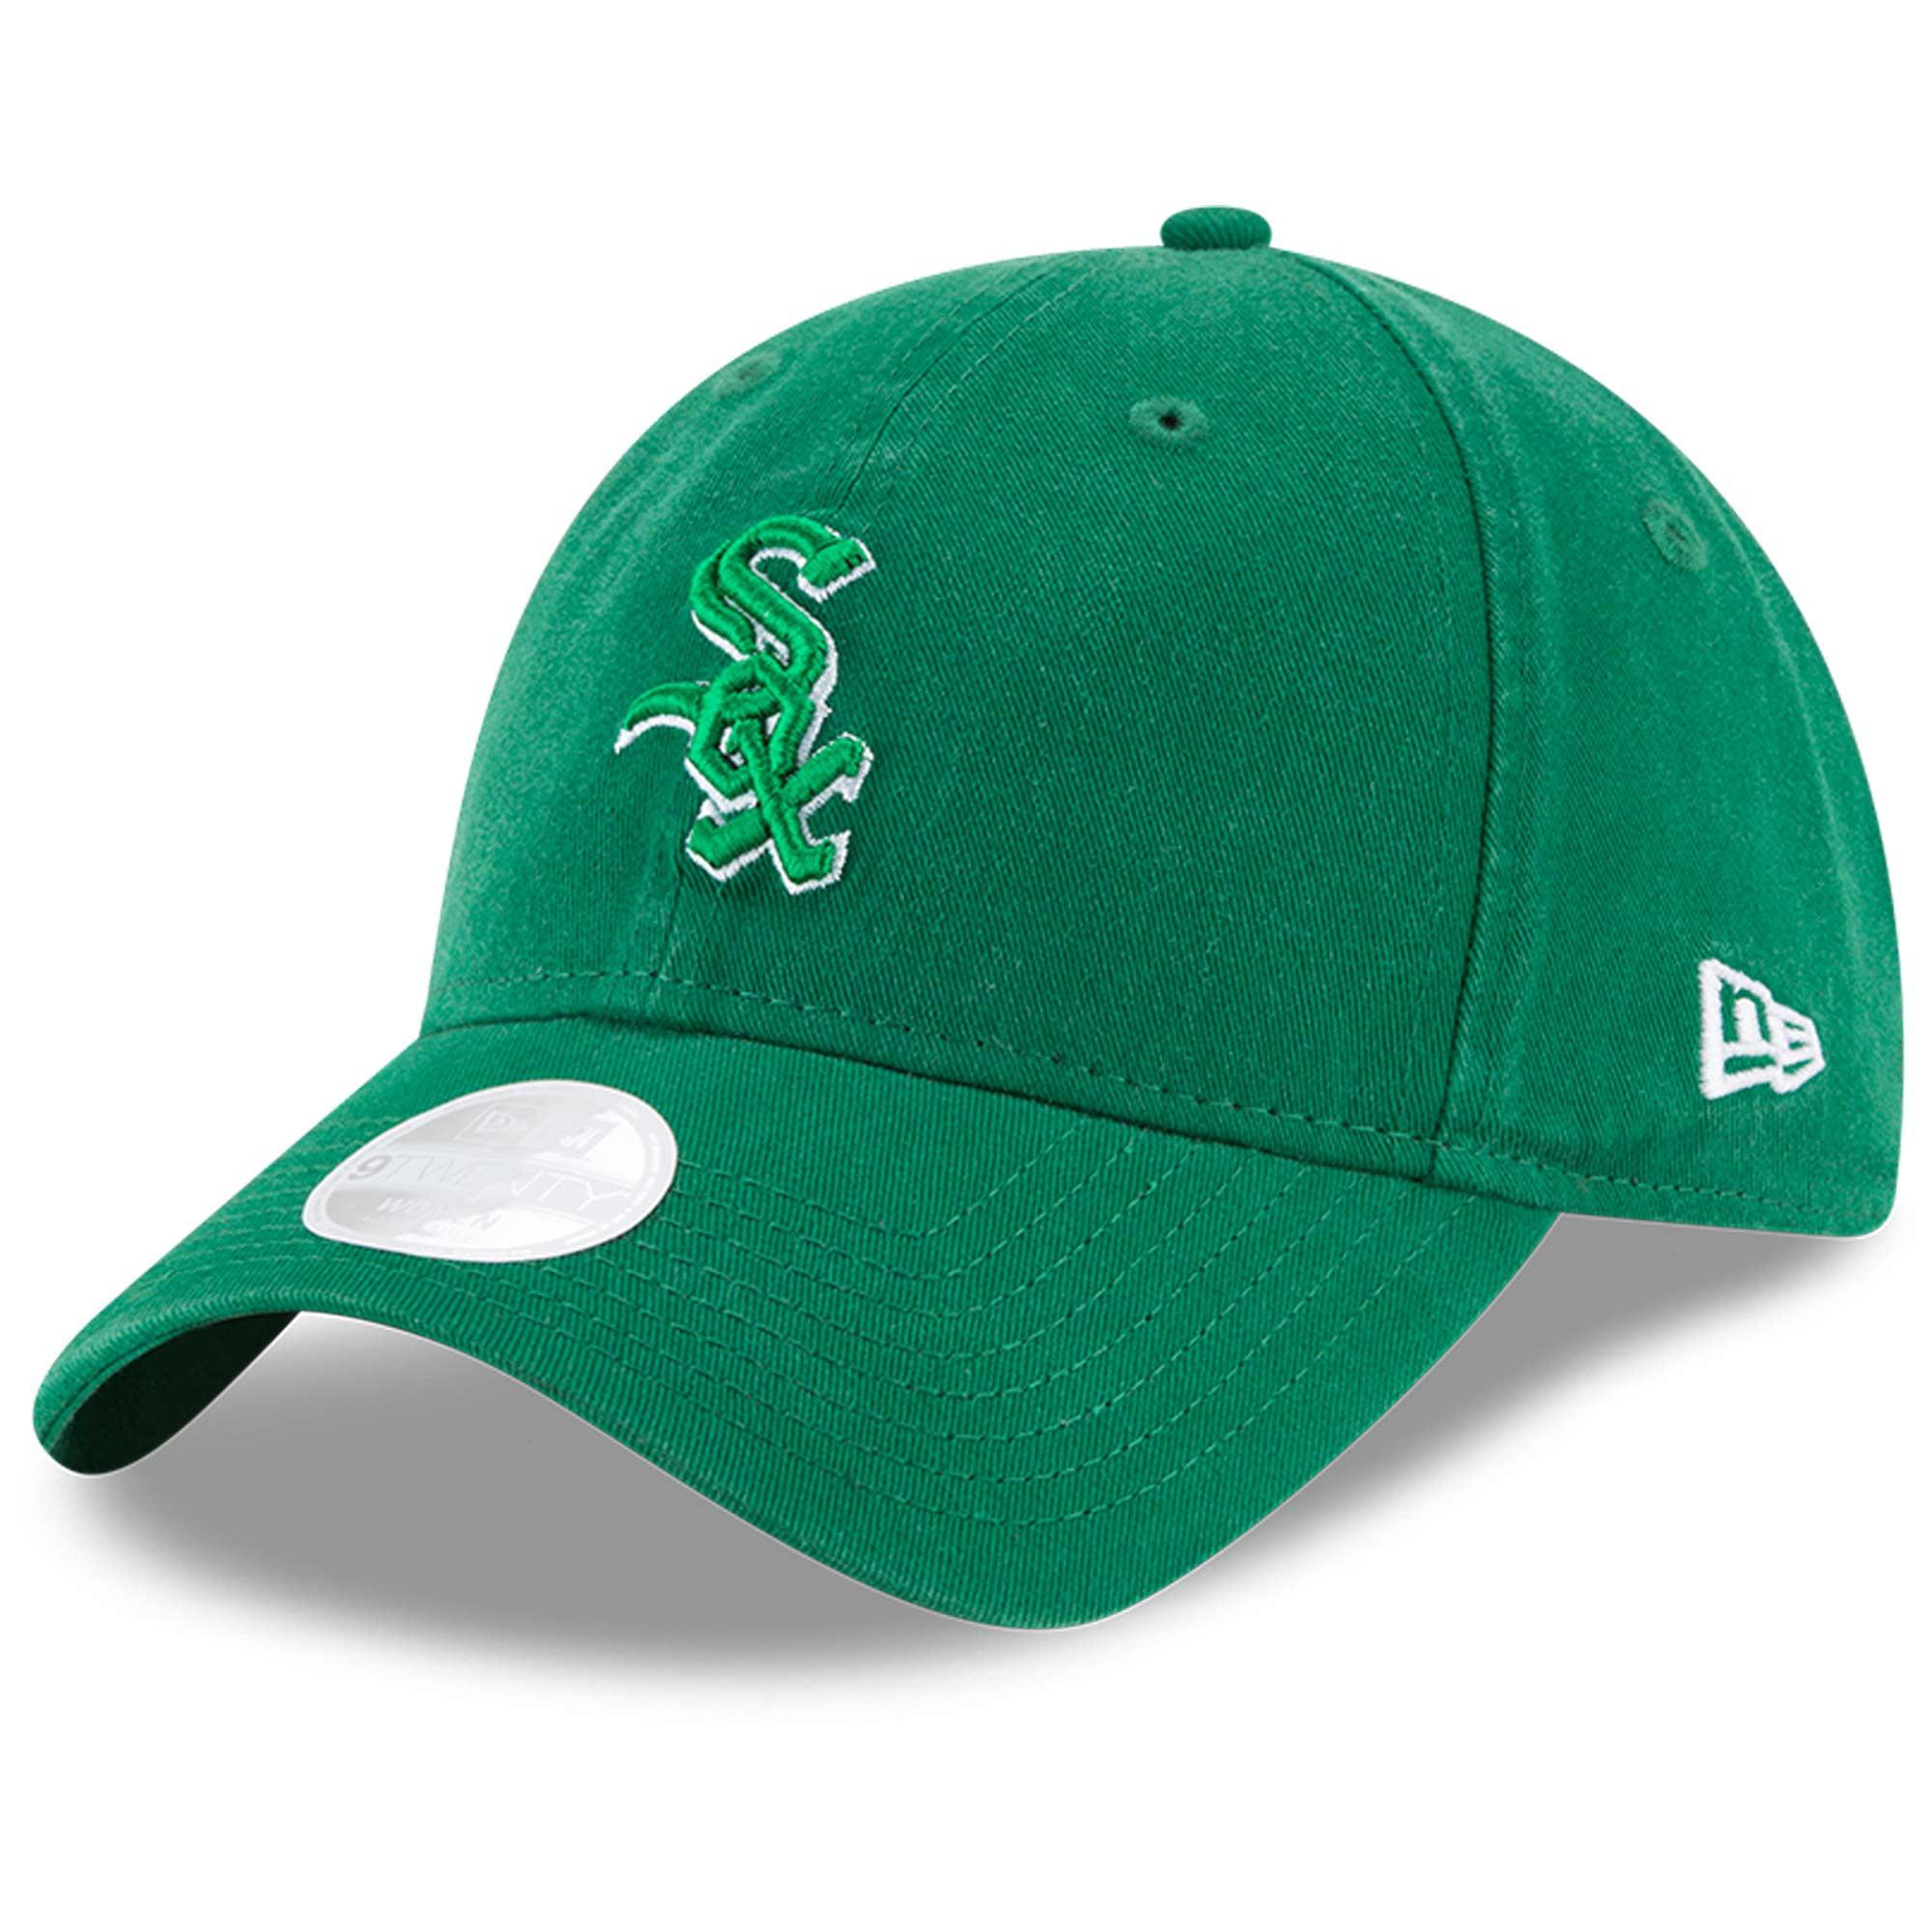 Chicago White Sox New Era Women's Core Classic Twill St. Patrick's Day 9TWENTY Adjustable Hat - Green - OSFA